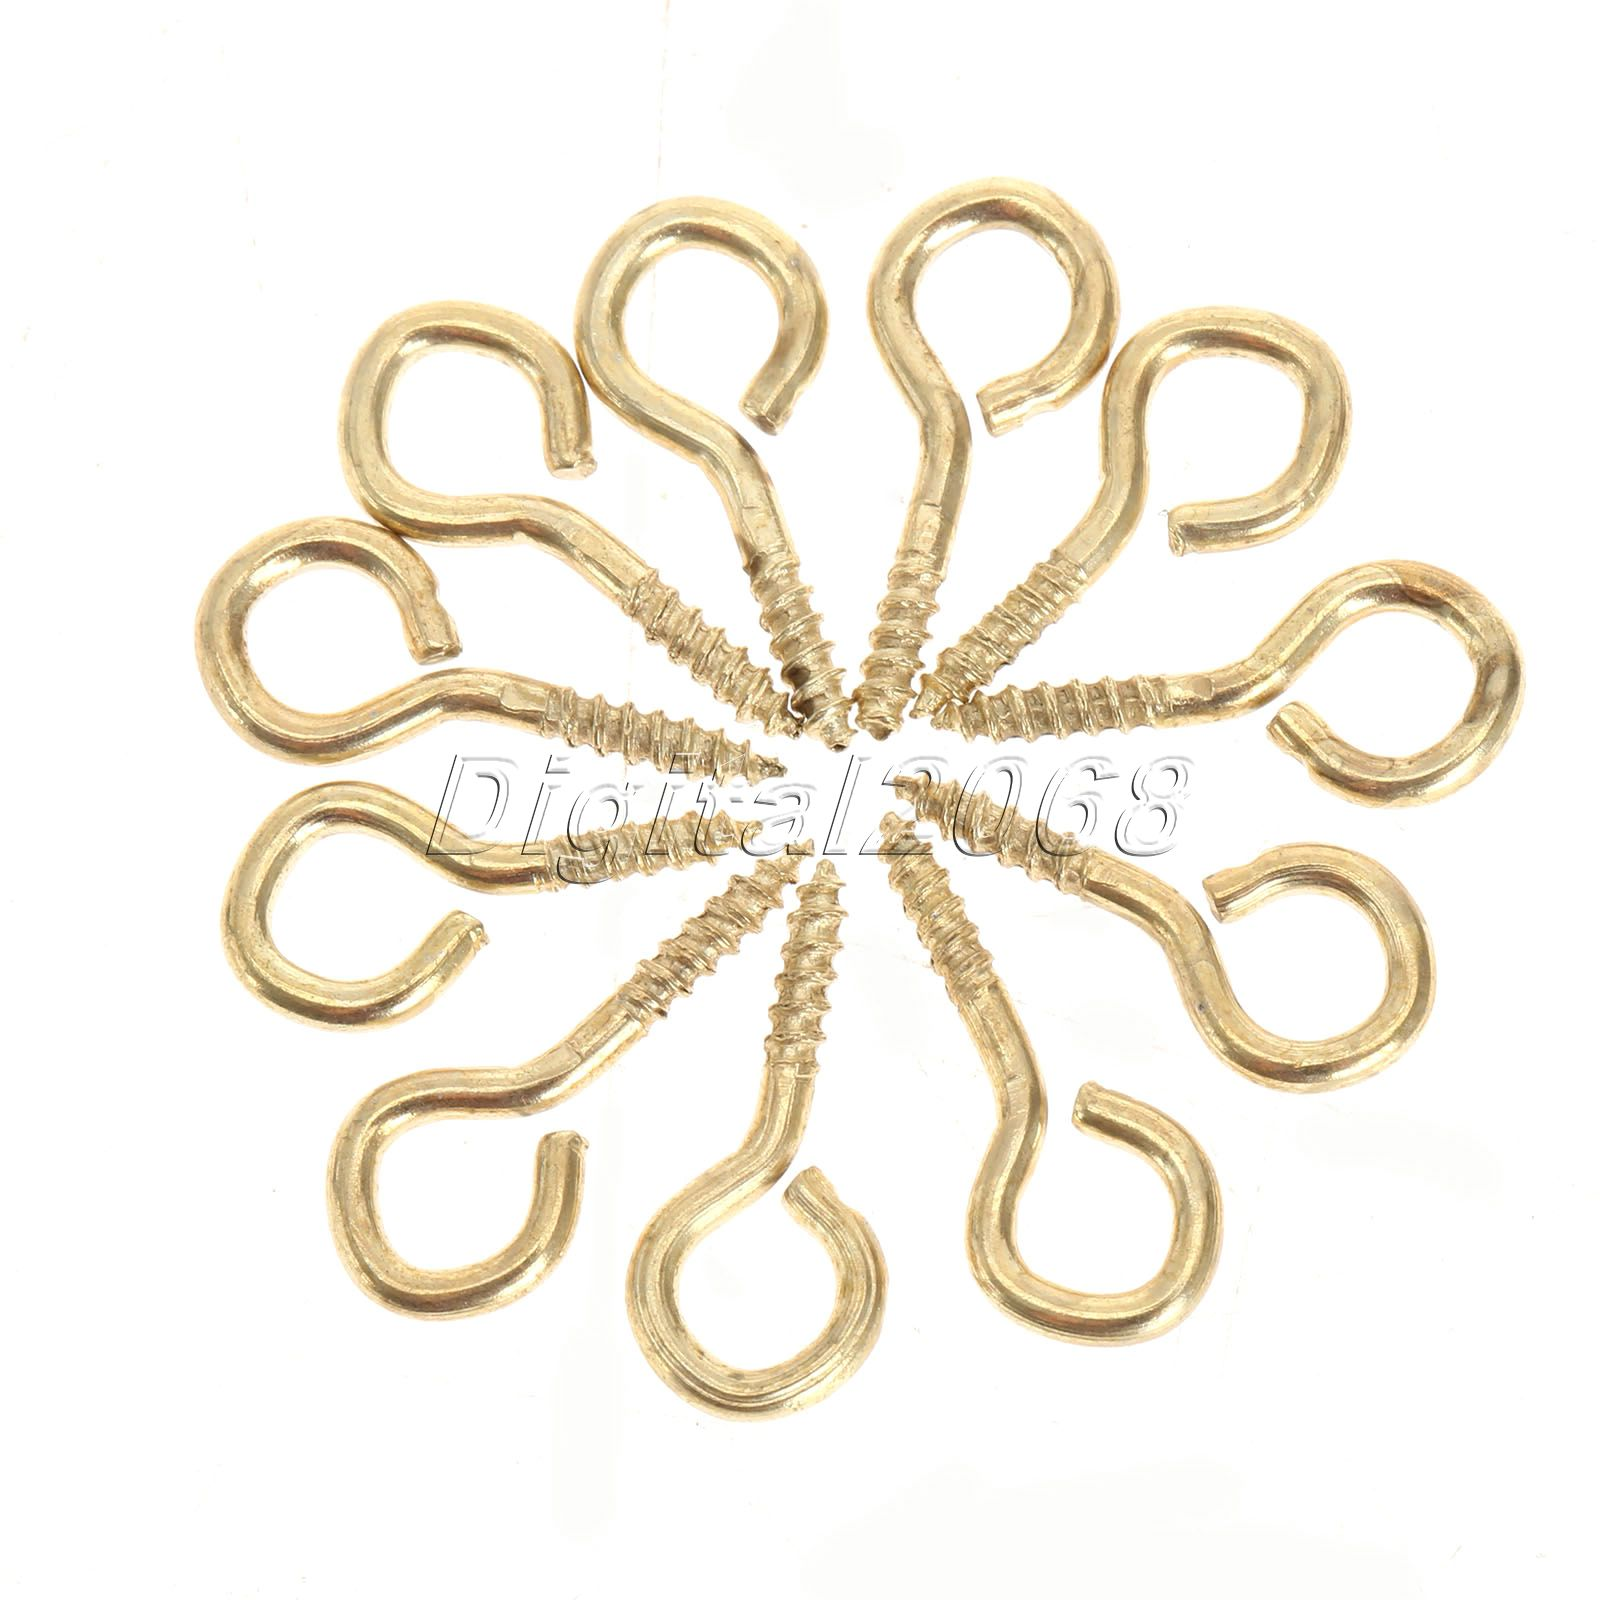 600pcs 13 x 6mm Mini Metal Screw Eye Pins Hooks Eyelet Screws Tiny Threaded Pins for Jewelry Making DIY Crafts